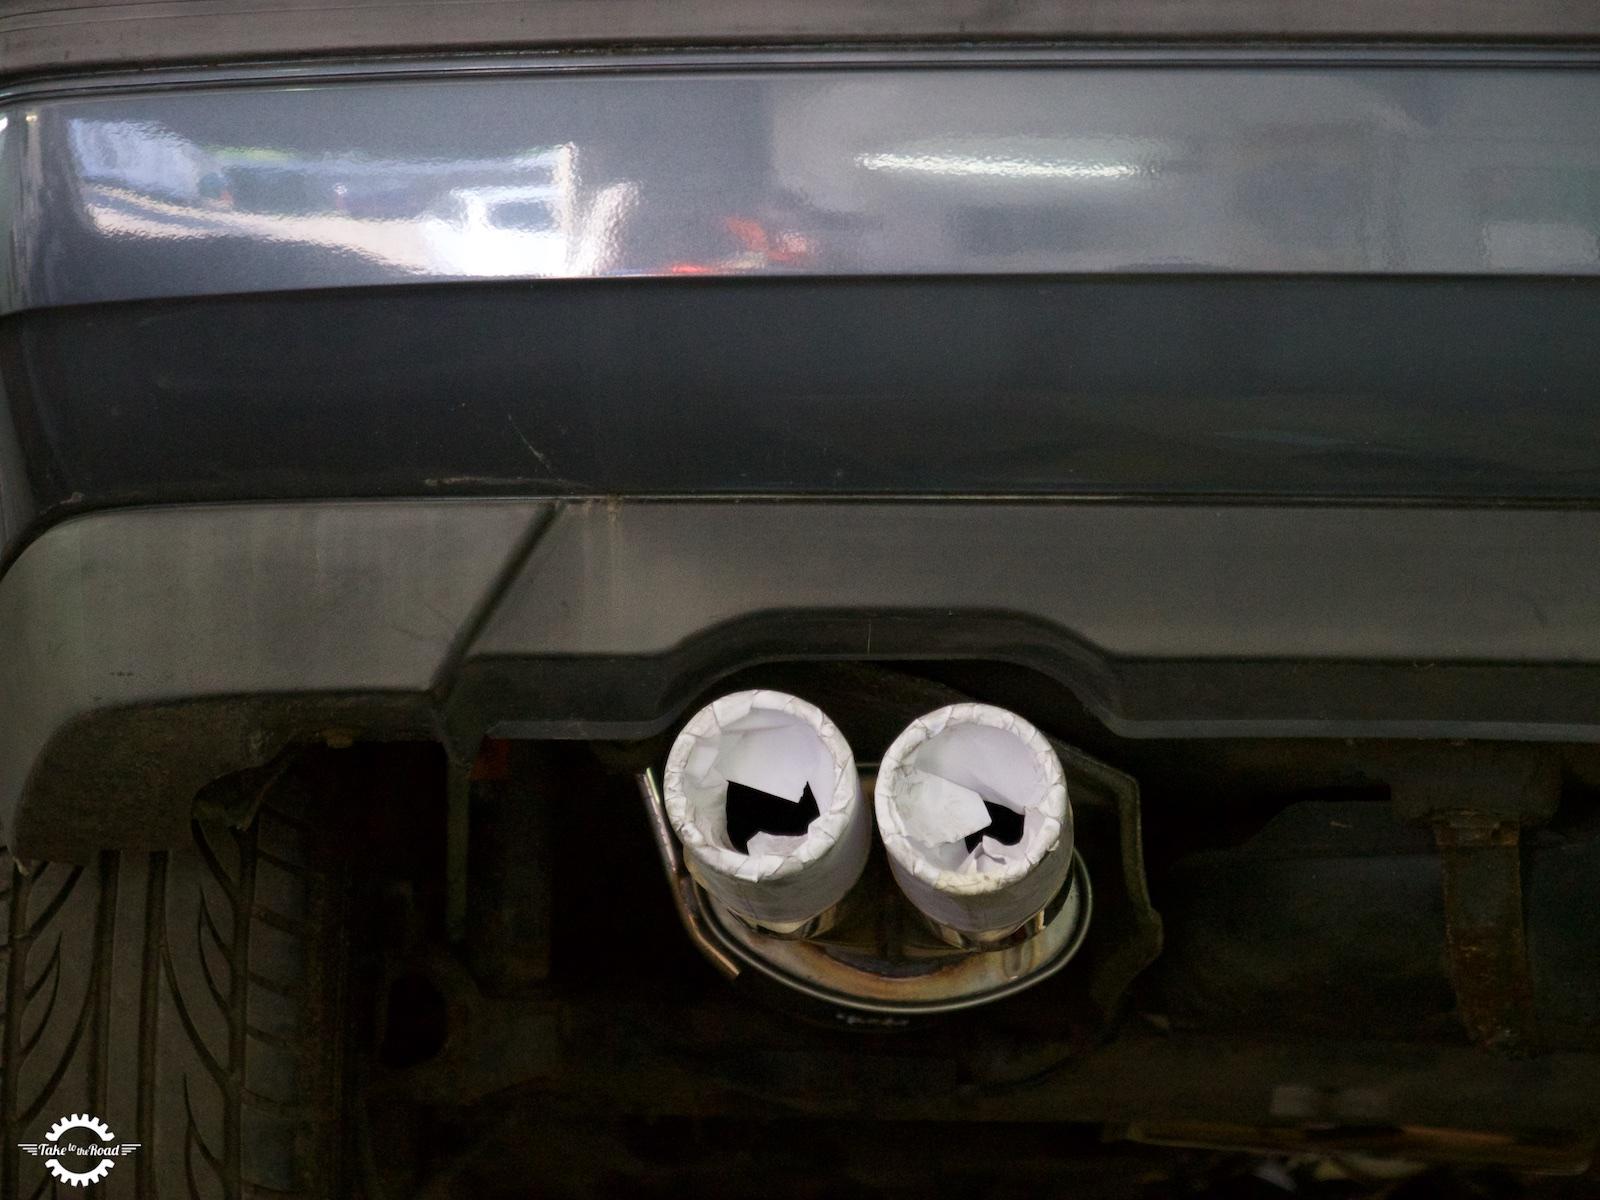 VW Golf Mk3 GTi Jetex Exhaust Install Guide